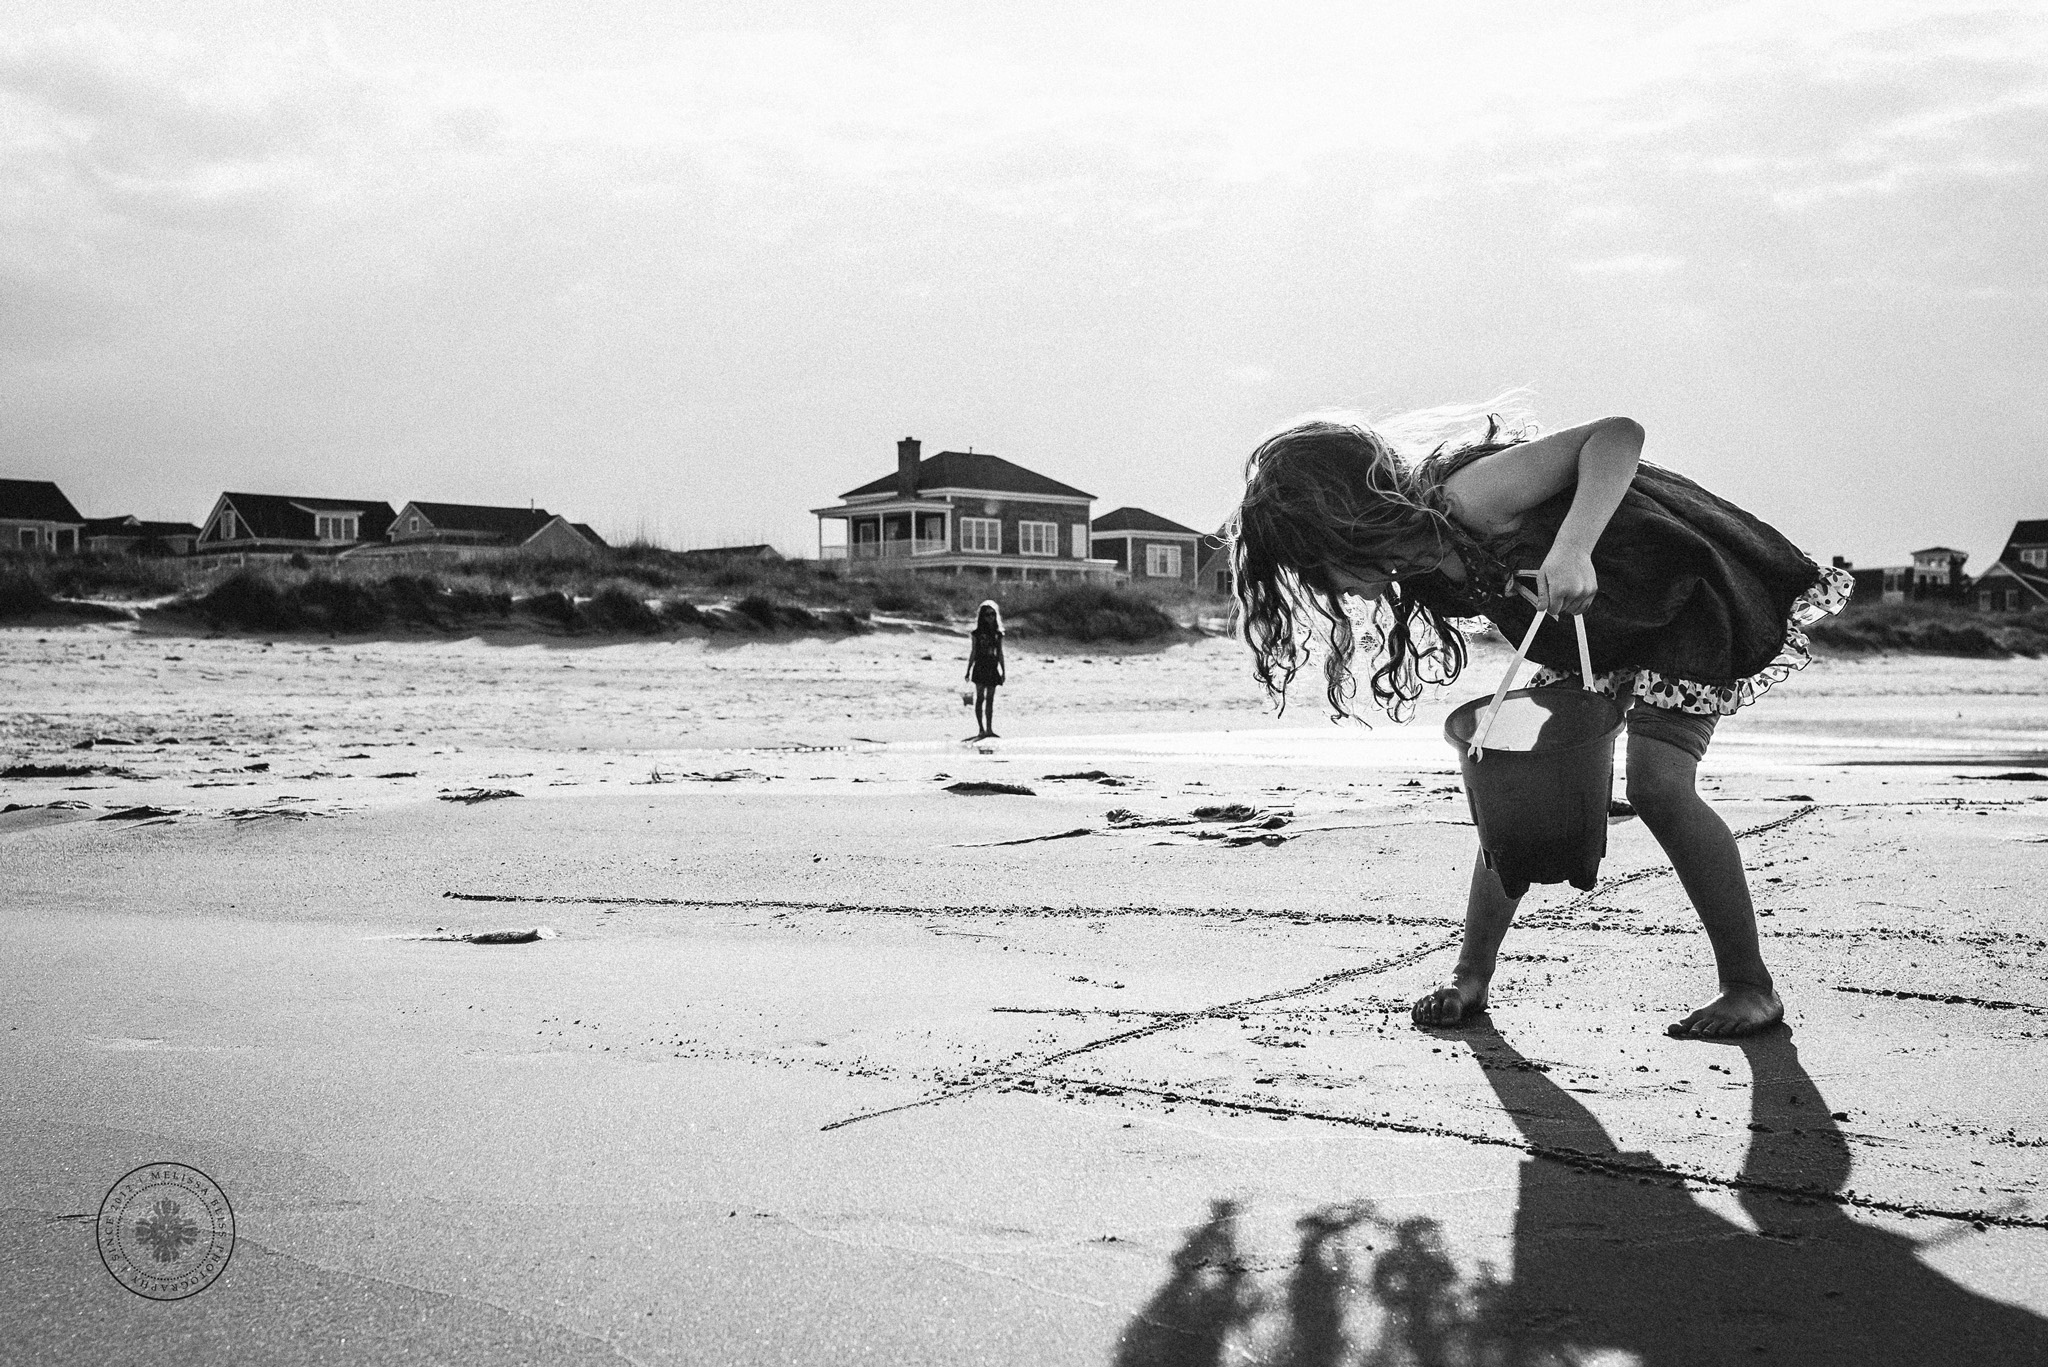 melissa-bliss-photography-sandbridge-award-winning-photographers-black-and-white-girl-playing-in-sand